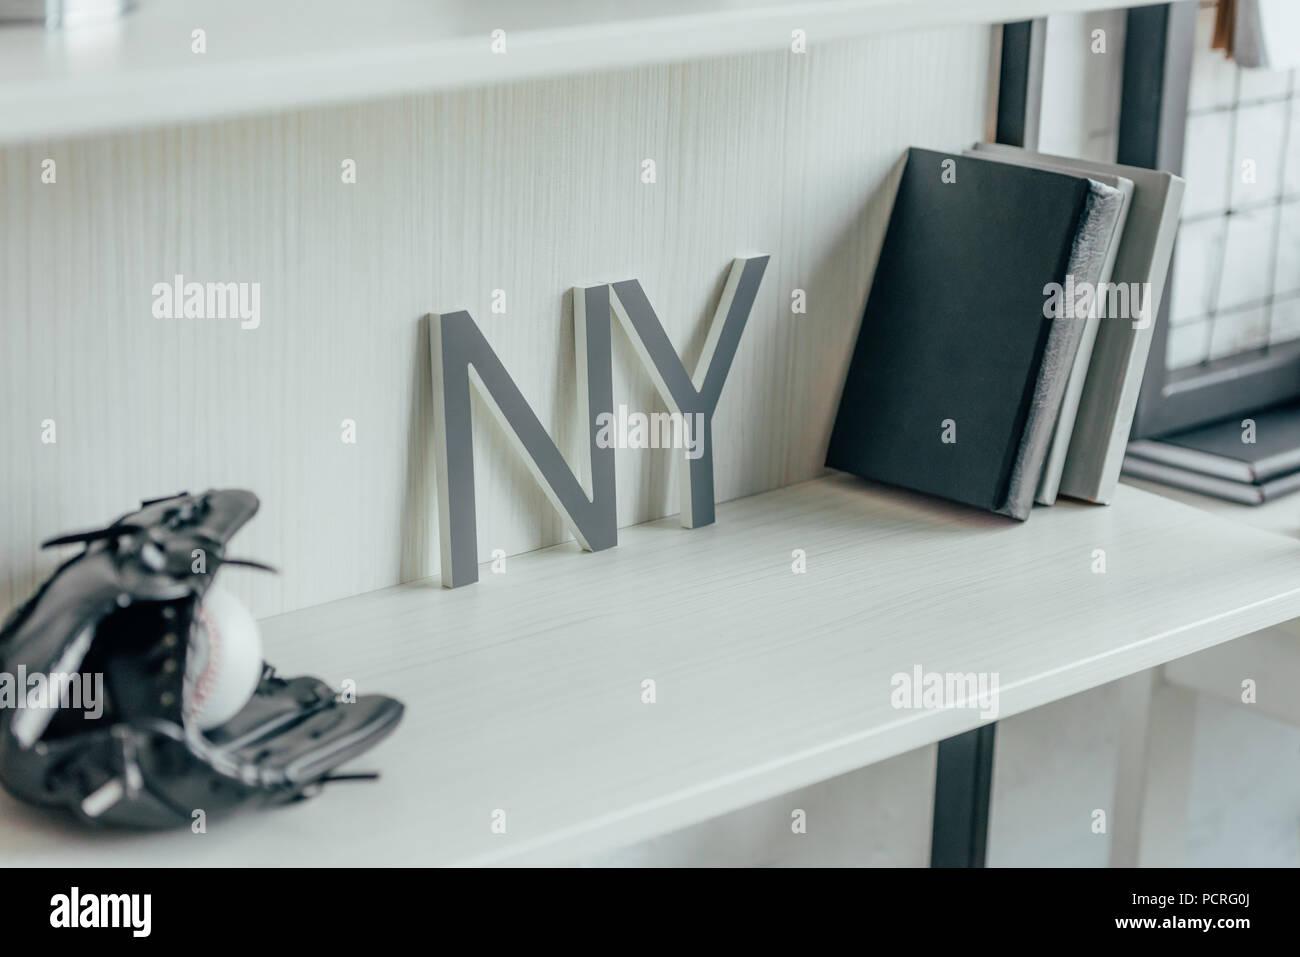 Baseball ball, Handschuh und Wort ny am Regal im Büro Stockbild